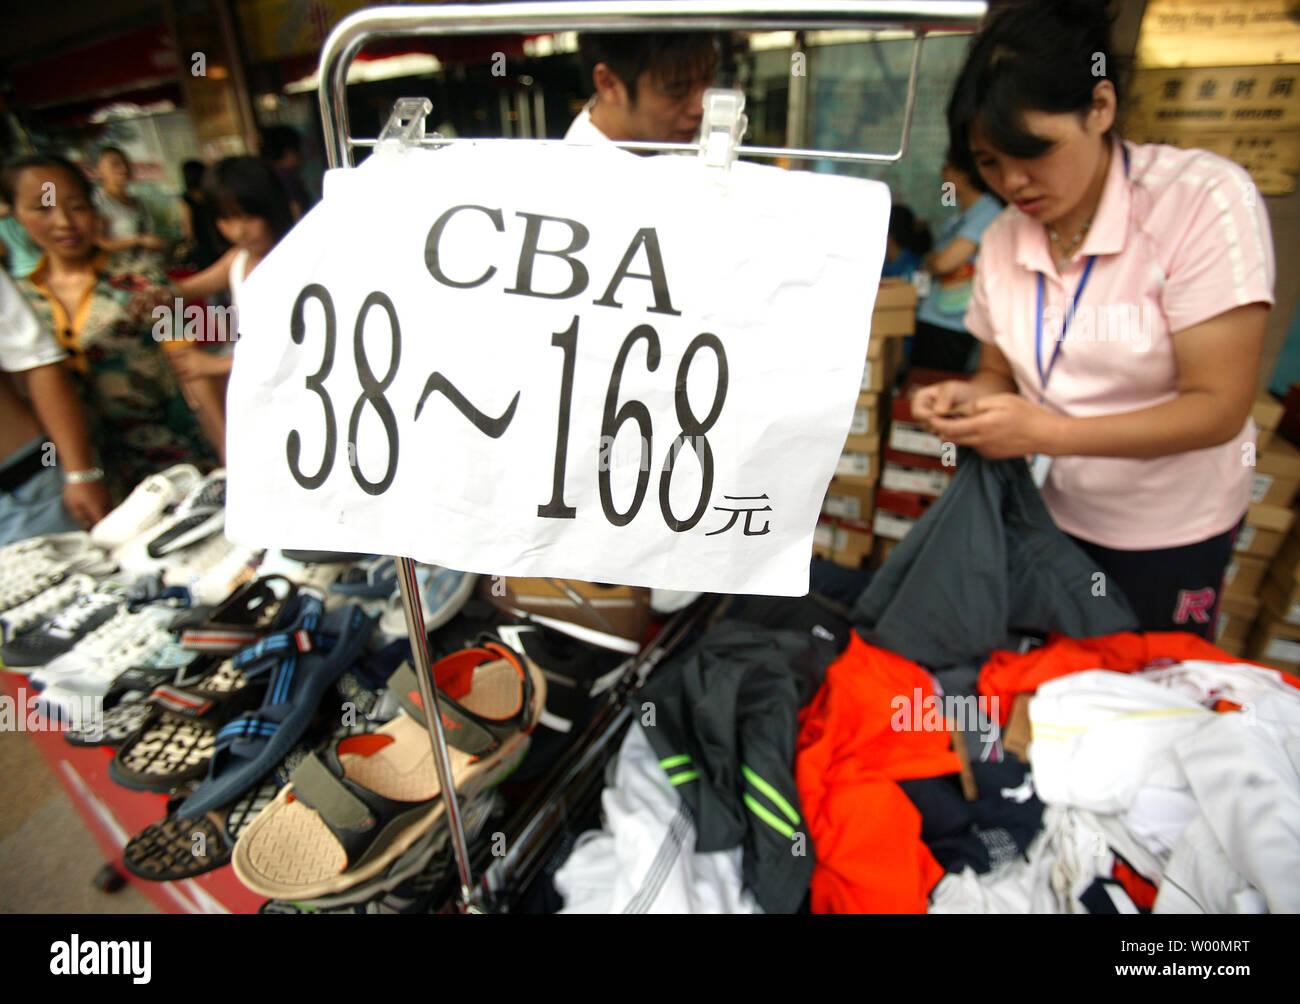 abf8436fc4e Counterfeits Stock Photos & Counterfeits Stock Images - Alamy